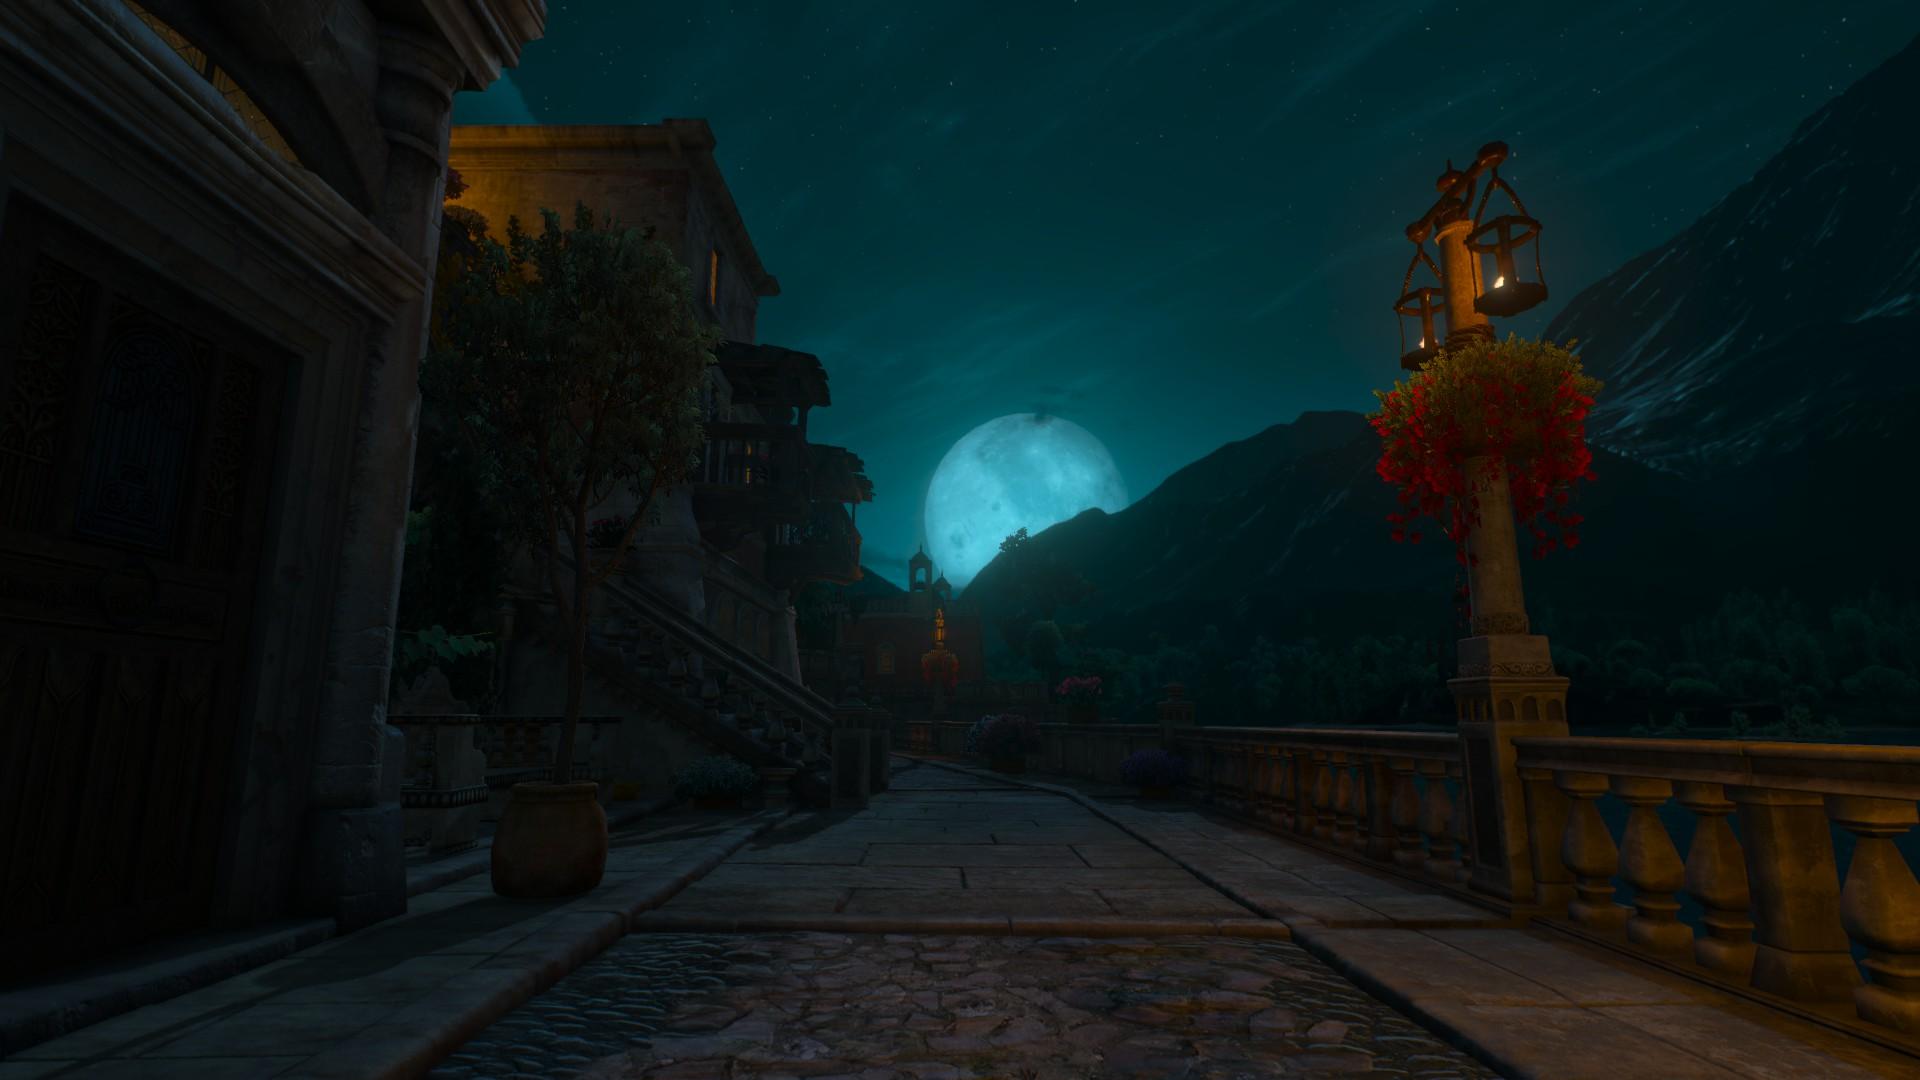 General 1920x1080 The Witcher 3: Wild Hunt Moon night video games The Witcher The Witcher 3: Wild Hunt - Blood and Wine DLC town